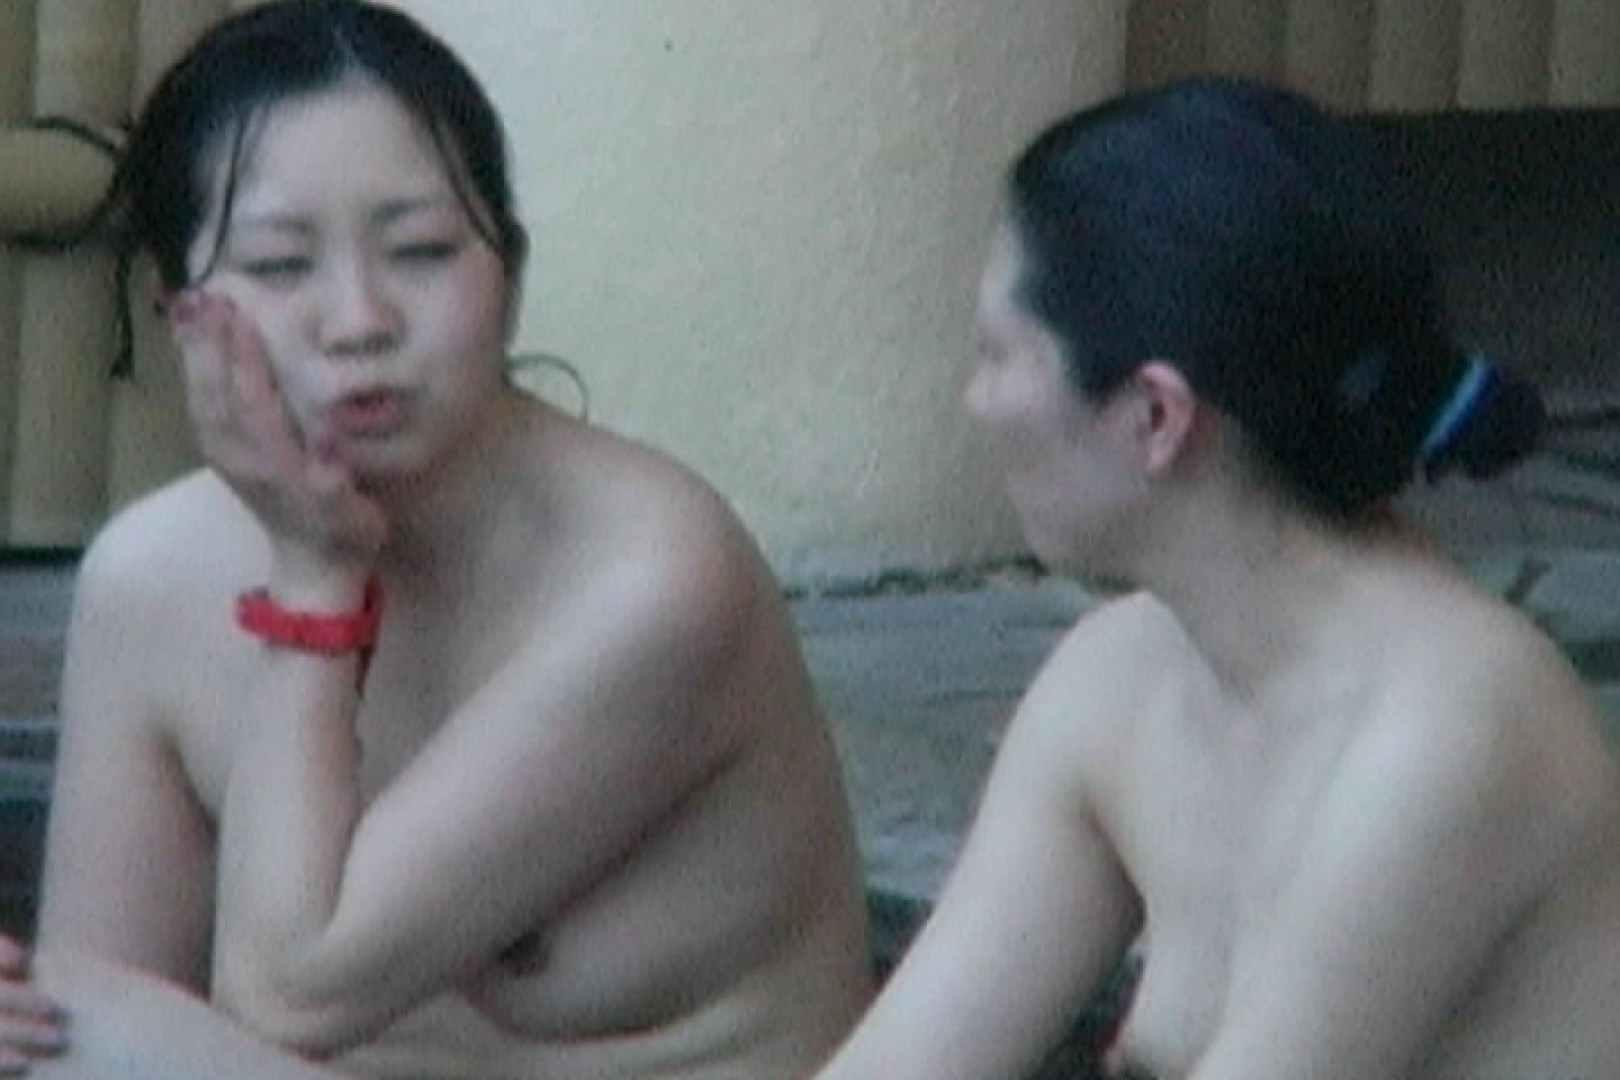 Aquaな露天風呂Vol.598 盗撮 エロ無料画像 79画像 38